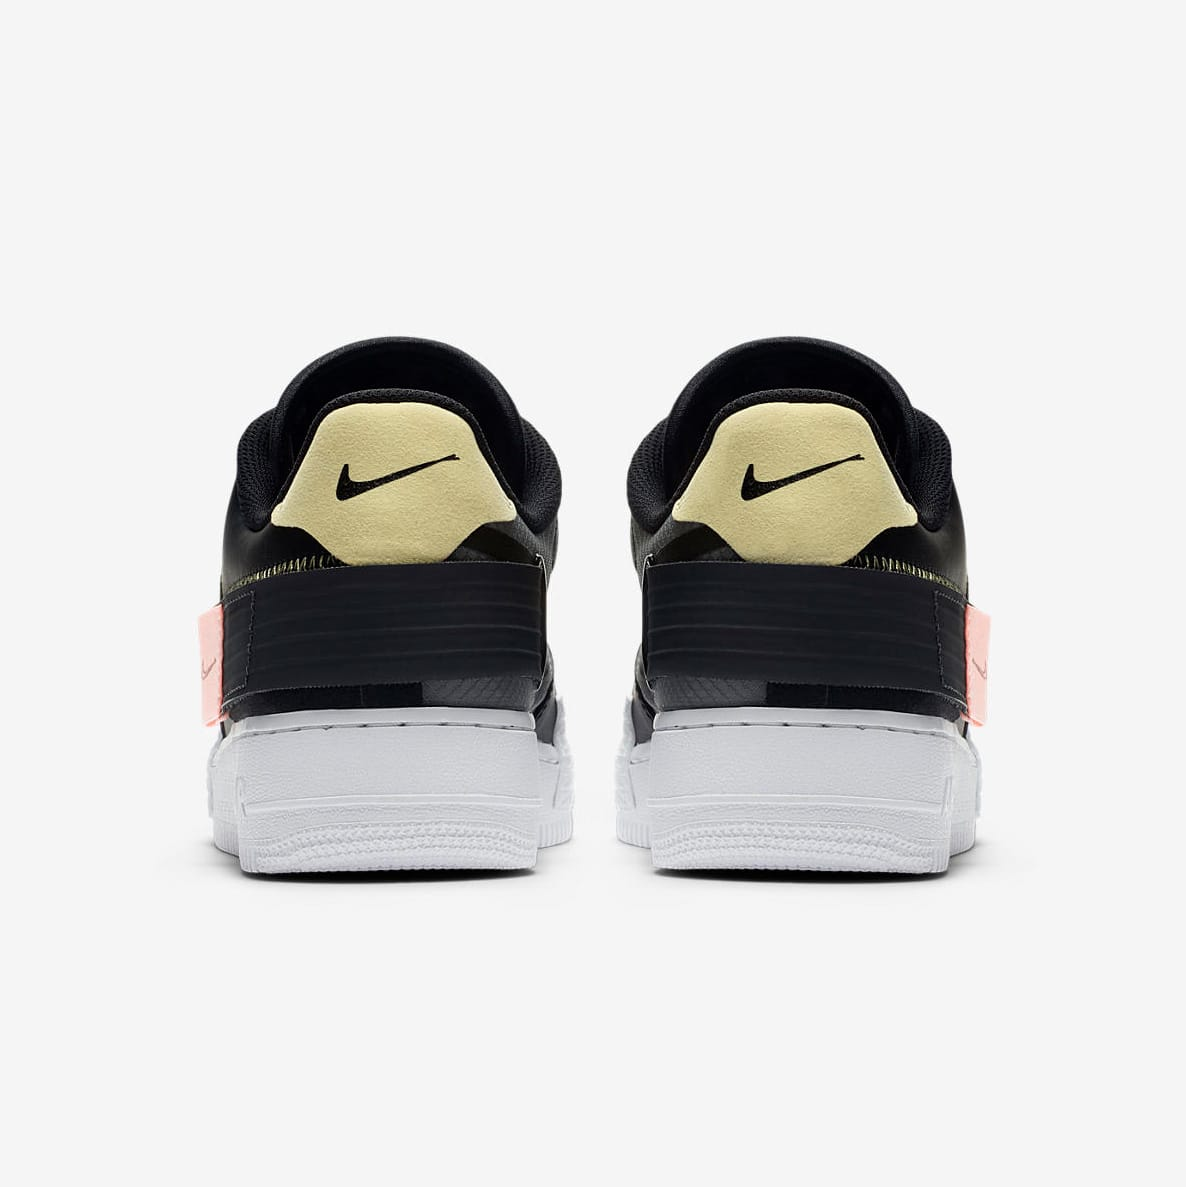 Nike Air Force 1 'Type' - ci0054-001